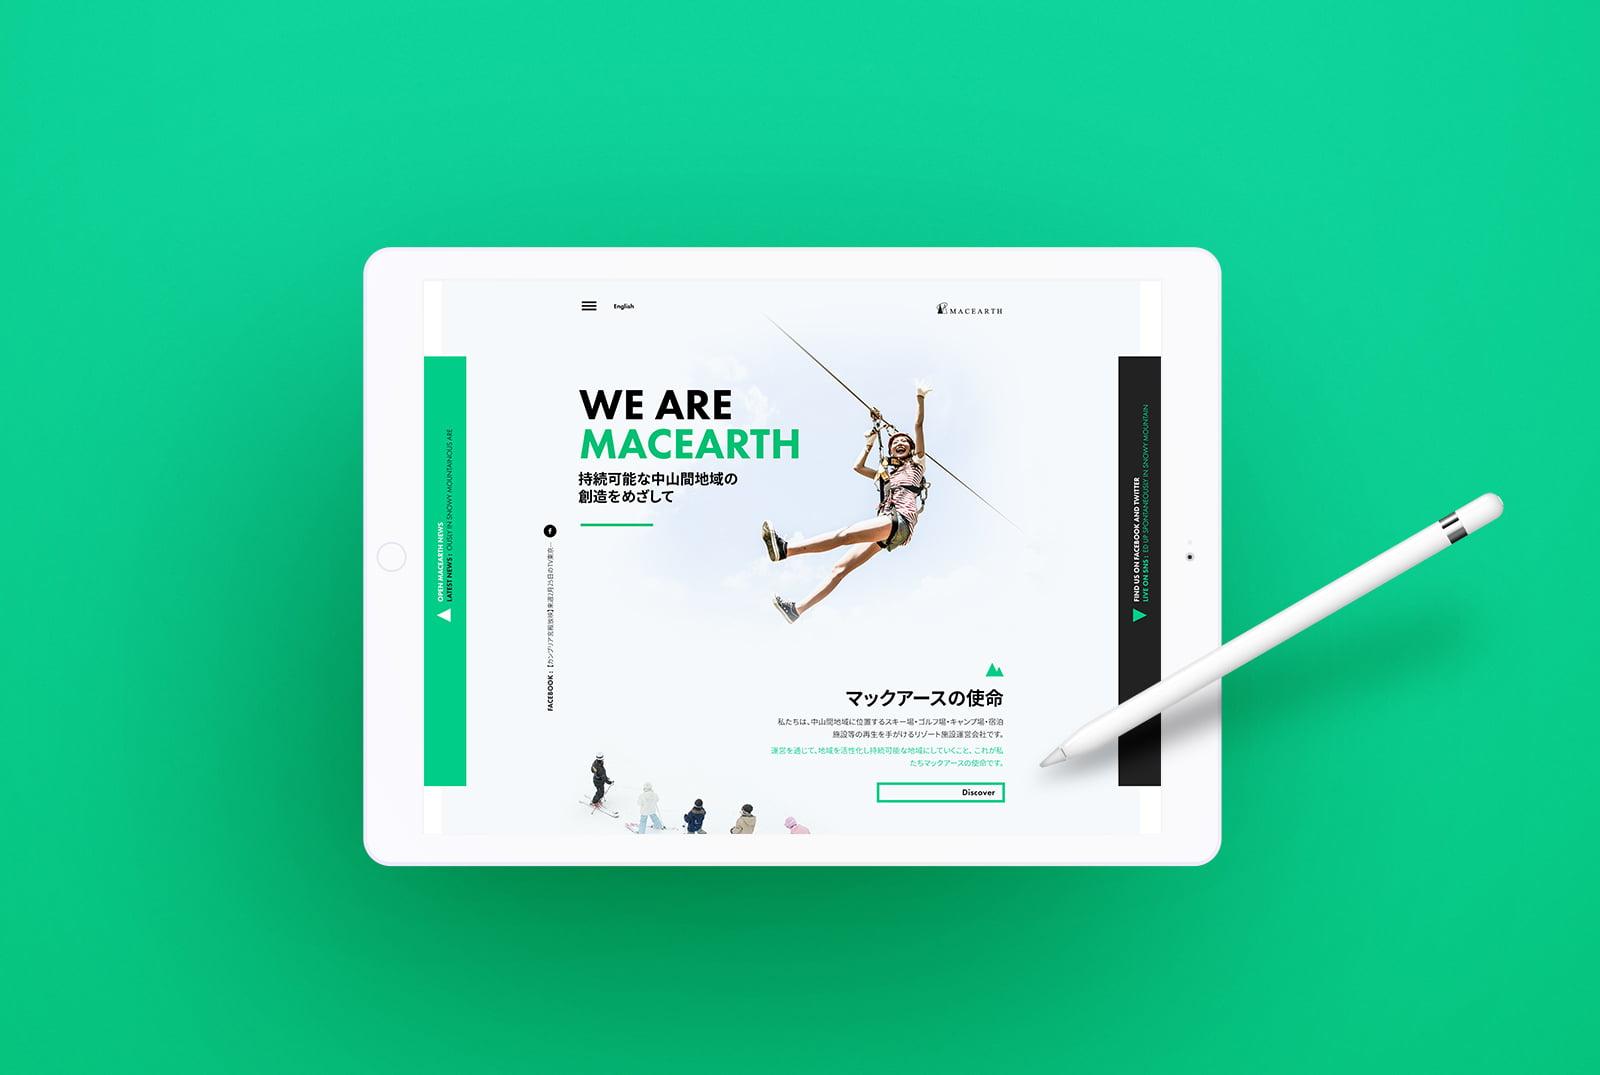 kourami-macearth-webdesign-01b